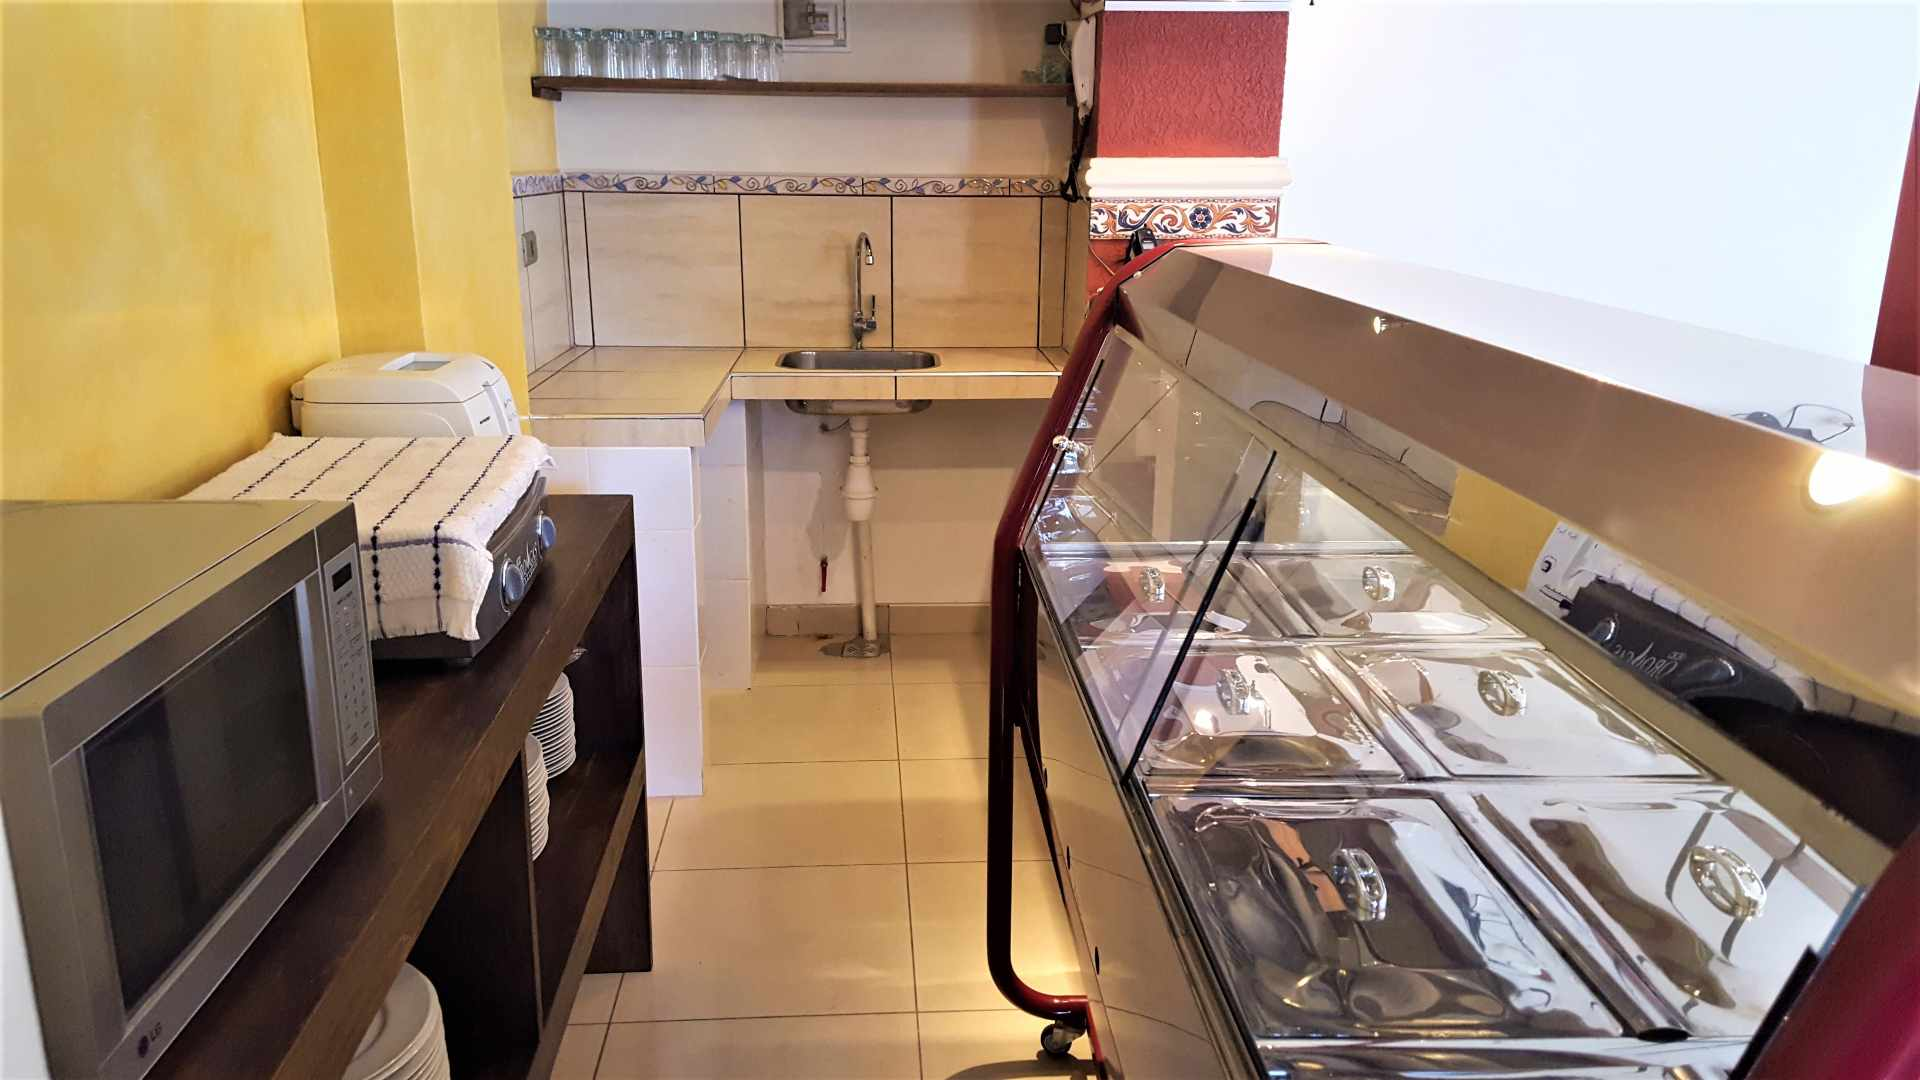 Local comercial en Venta $us 82.000.- LOCAL COMERCIAL IDEAL PARA RESTAURANTE - ZONA CALA CALA. CEL.: 799-98200 Foto 7